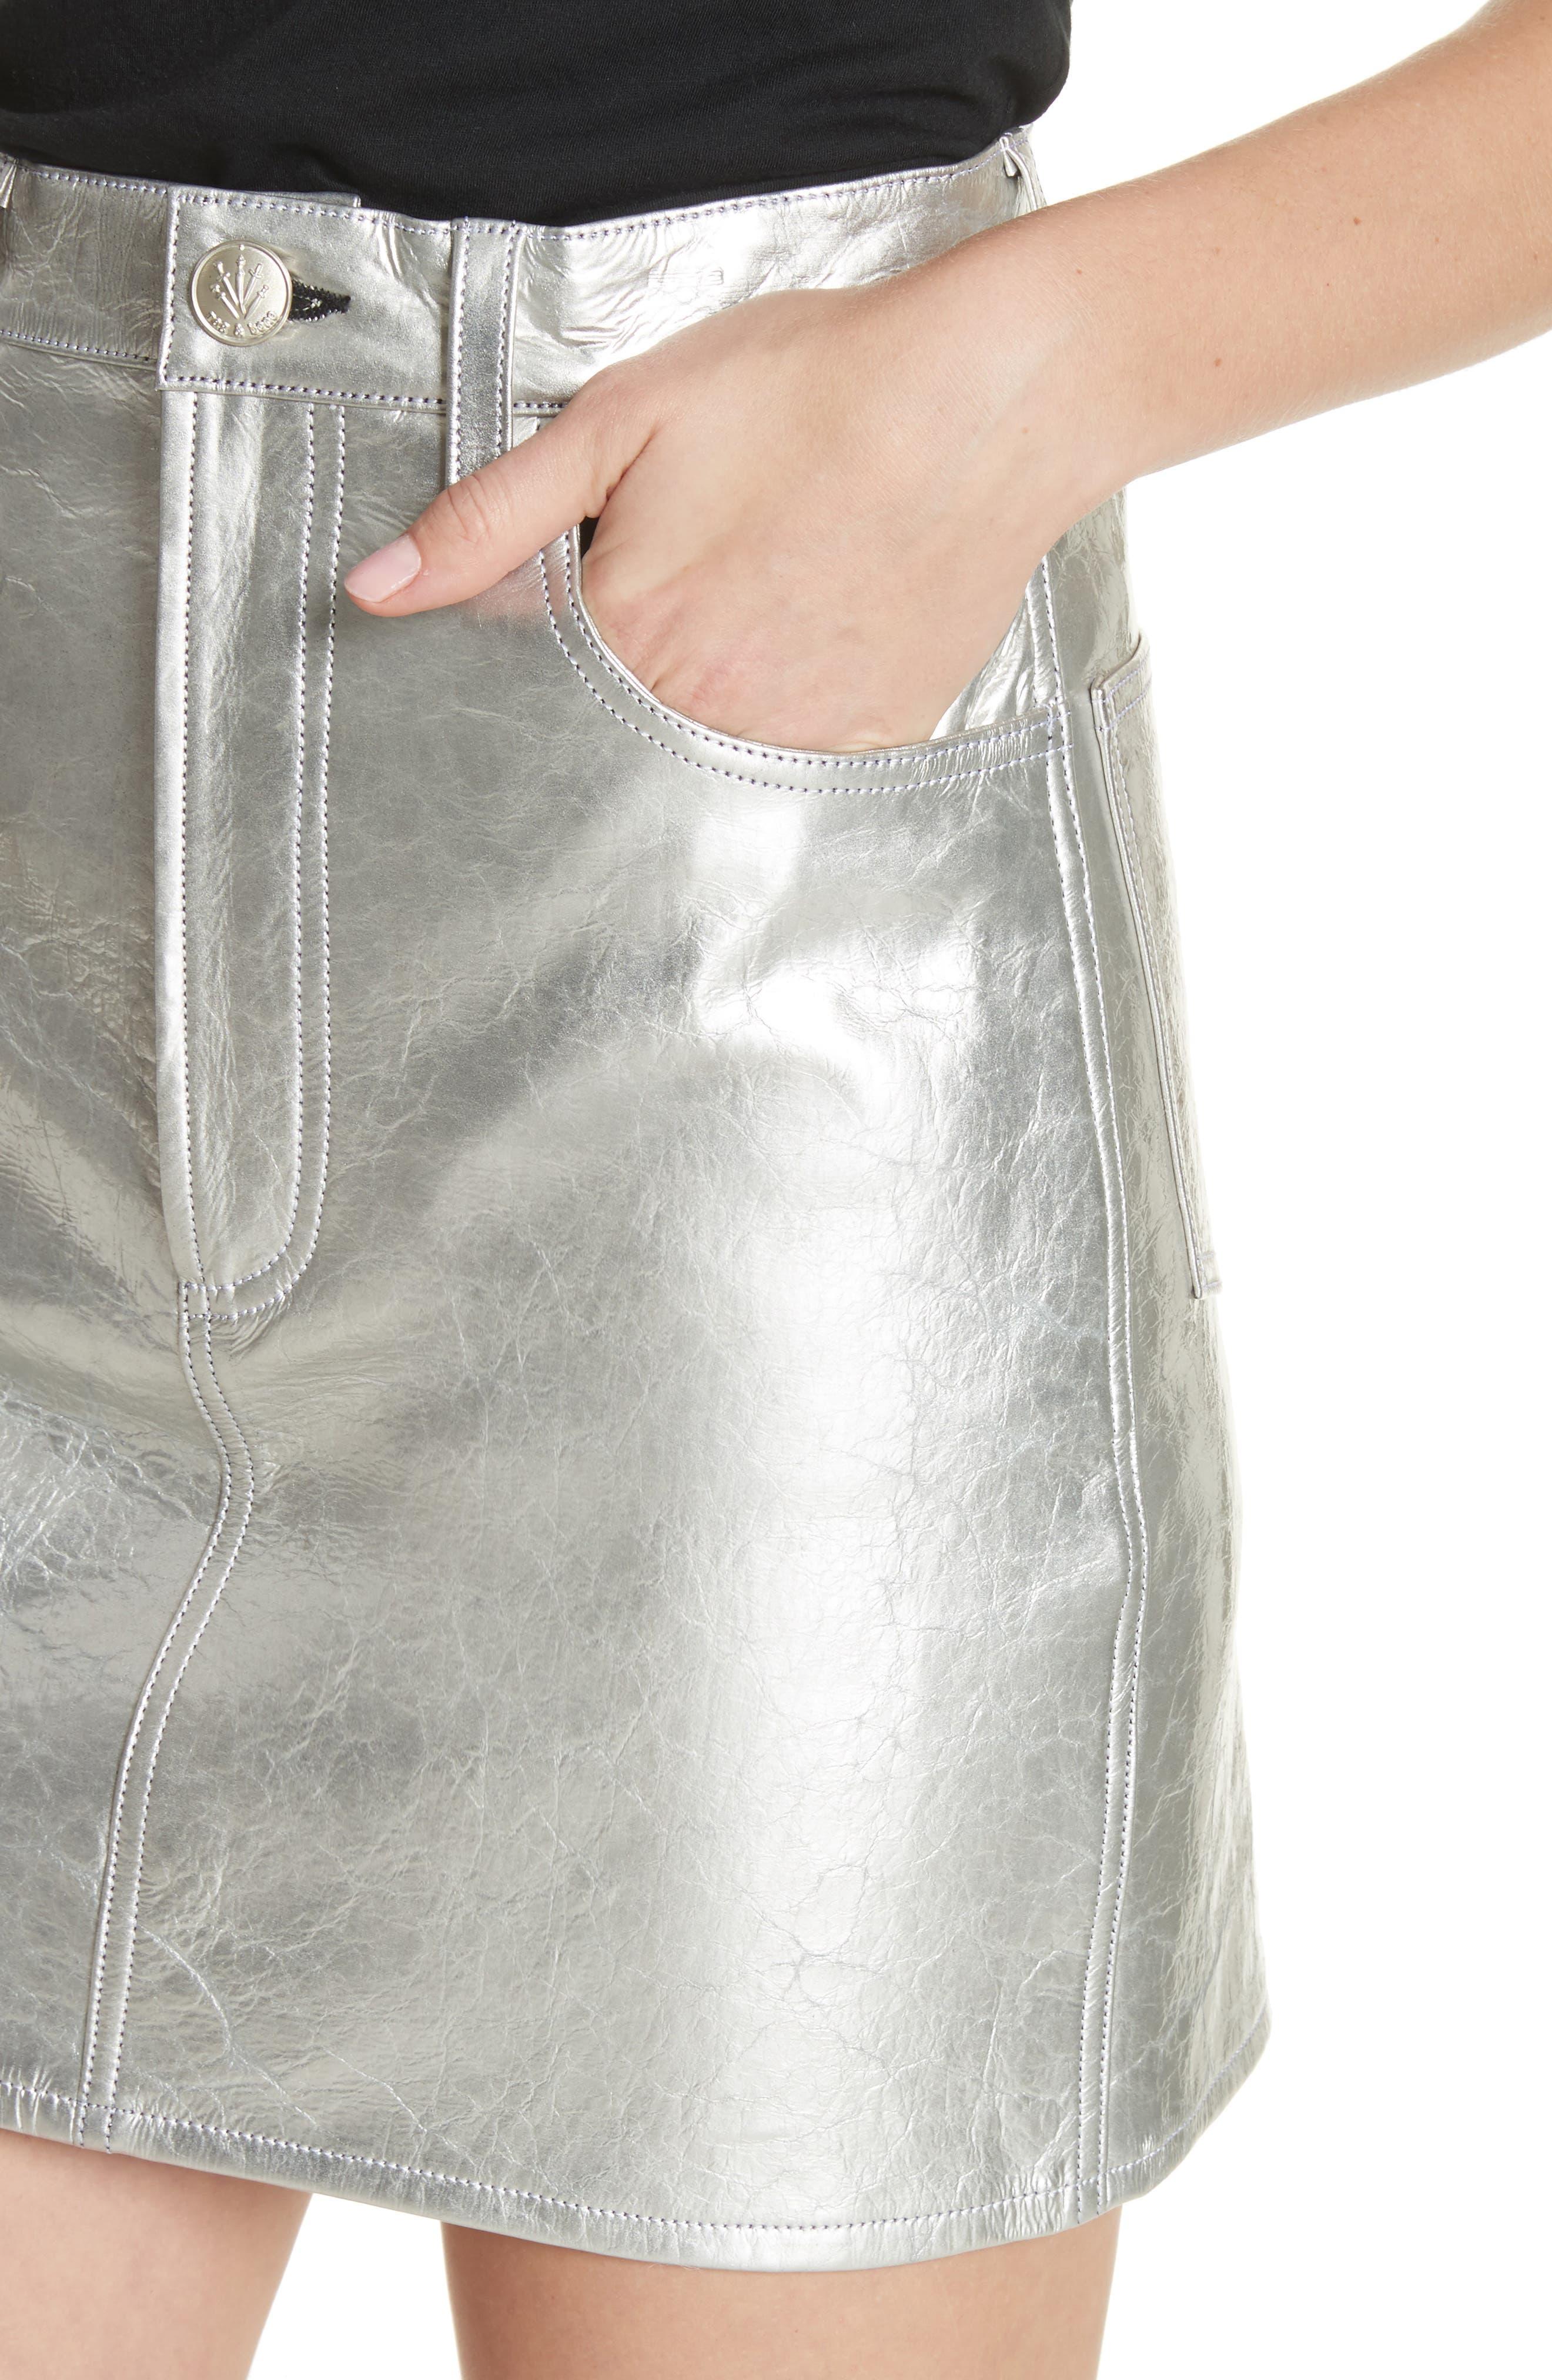 Moss High Waist Leather Miniskirt,                             Alternate thumbnail 4, color,                             Metallic